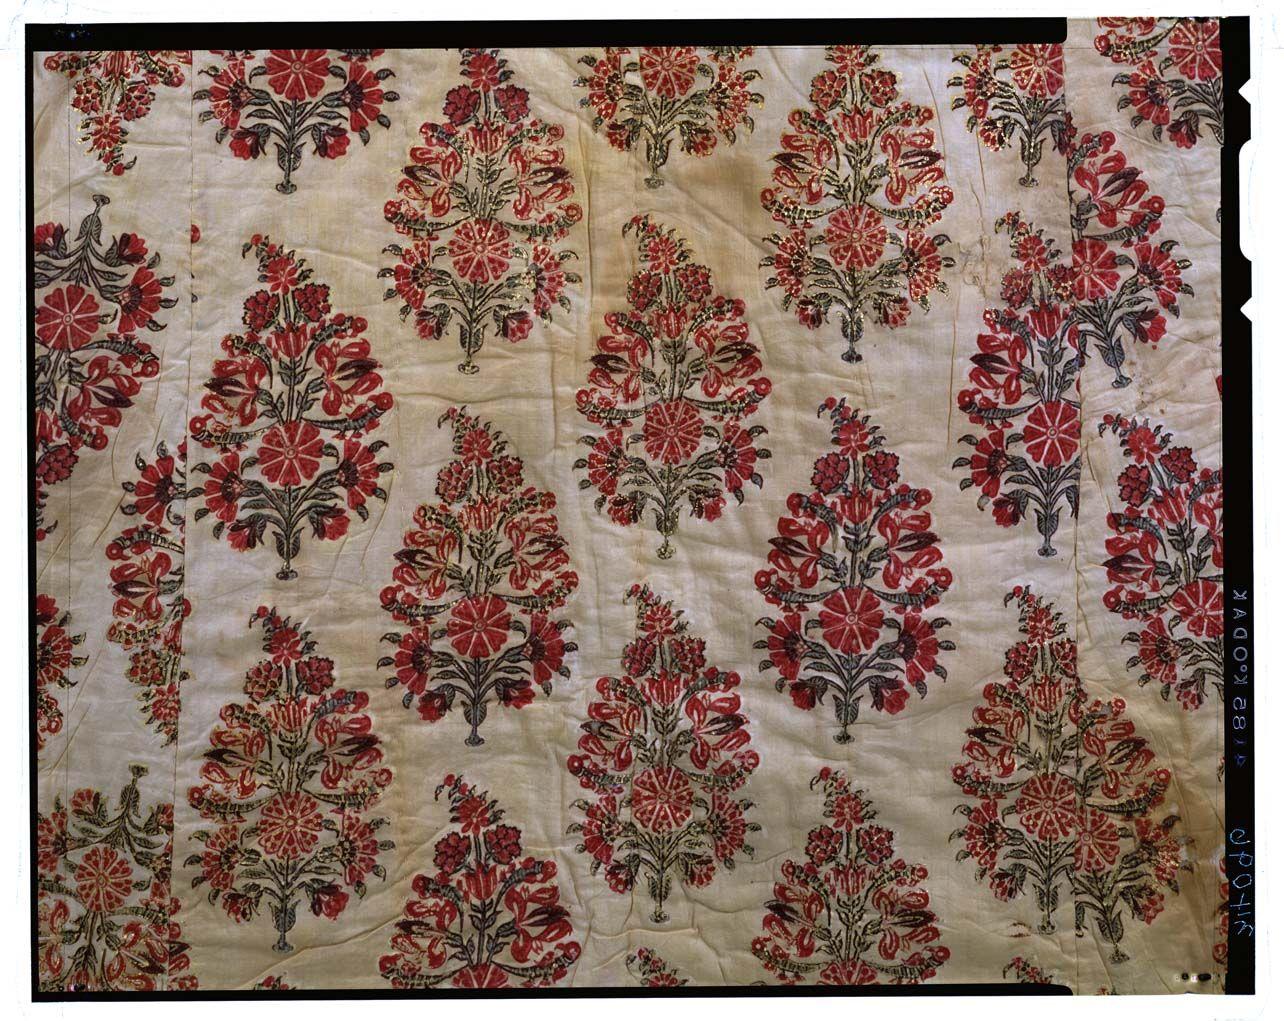 C0034096 白地花卉模様金更紗綿入コート - 東京国立博物館 画像検索